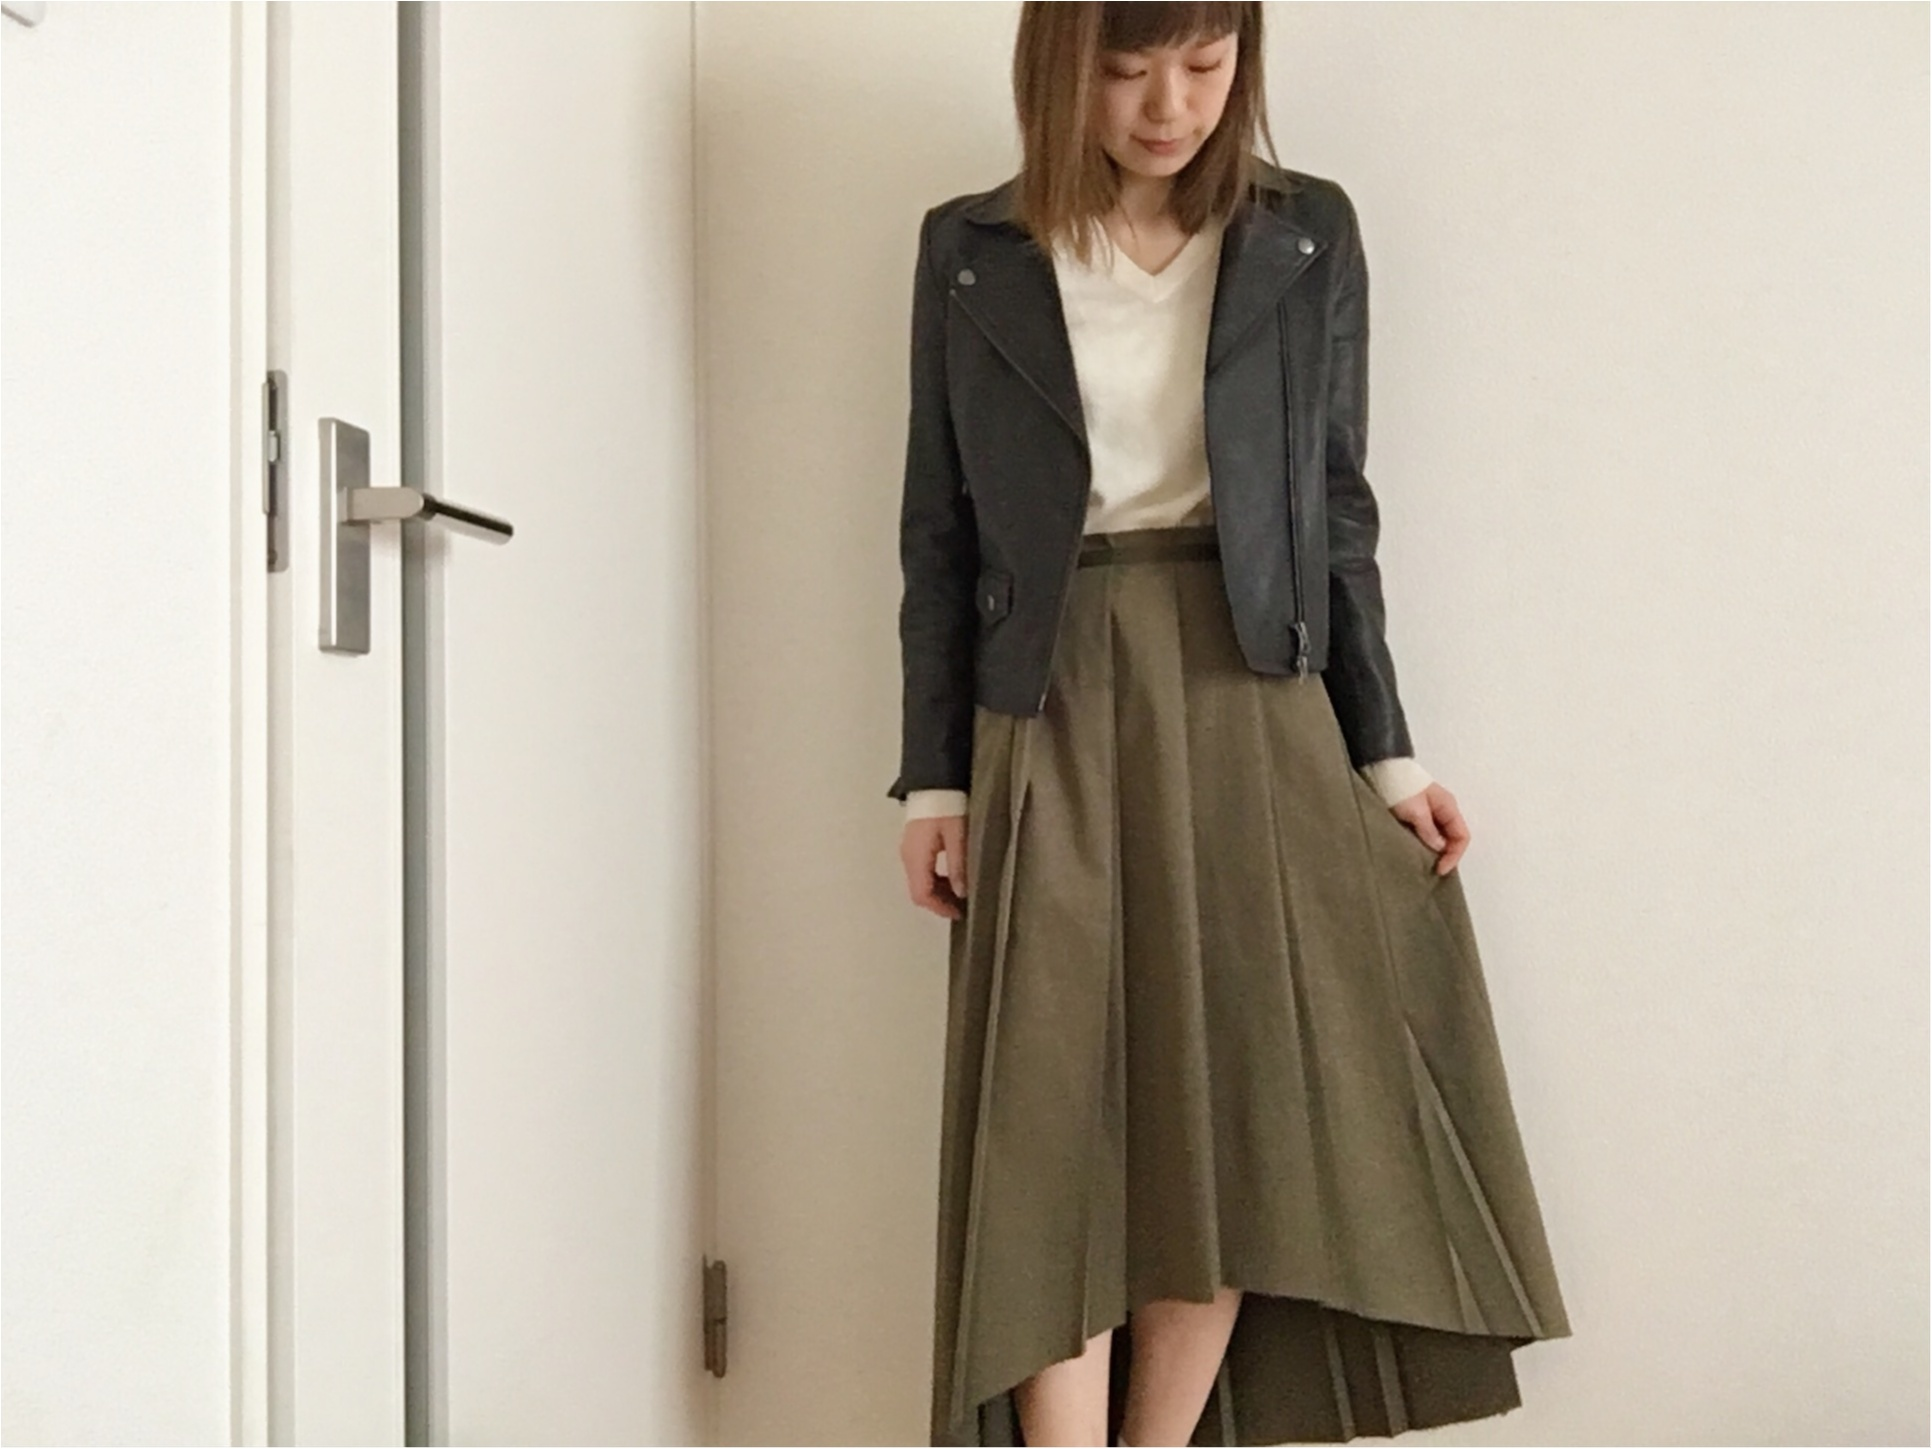 ★《ayachille code》7days fashion show!_6